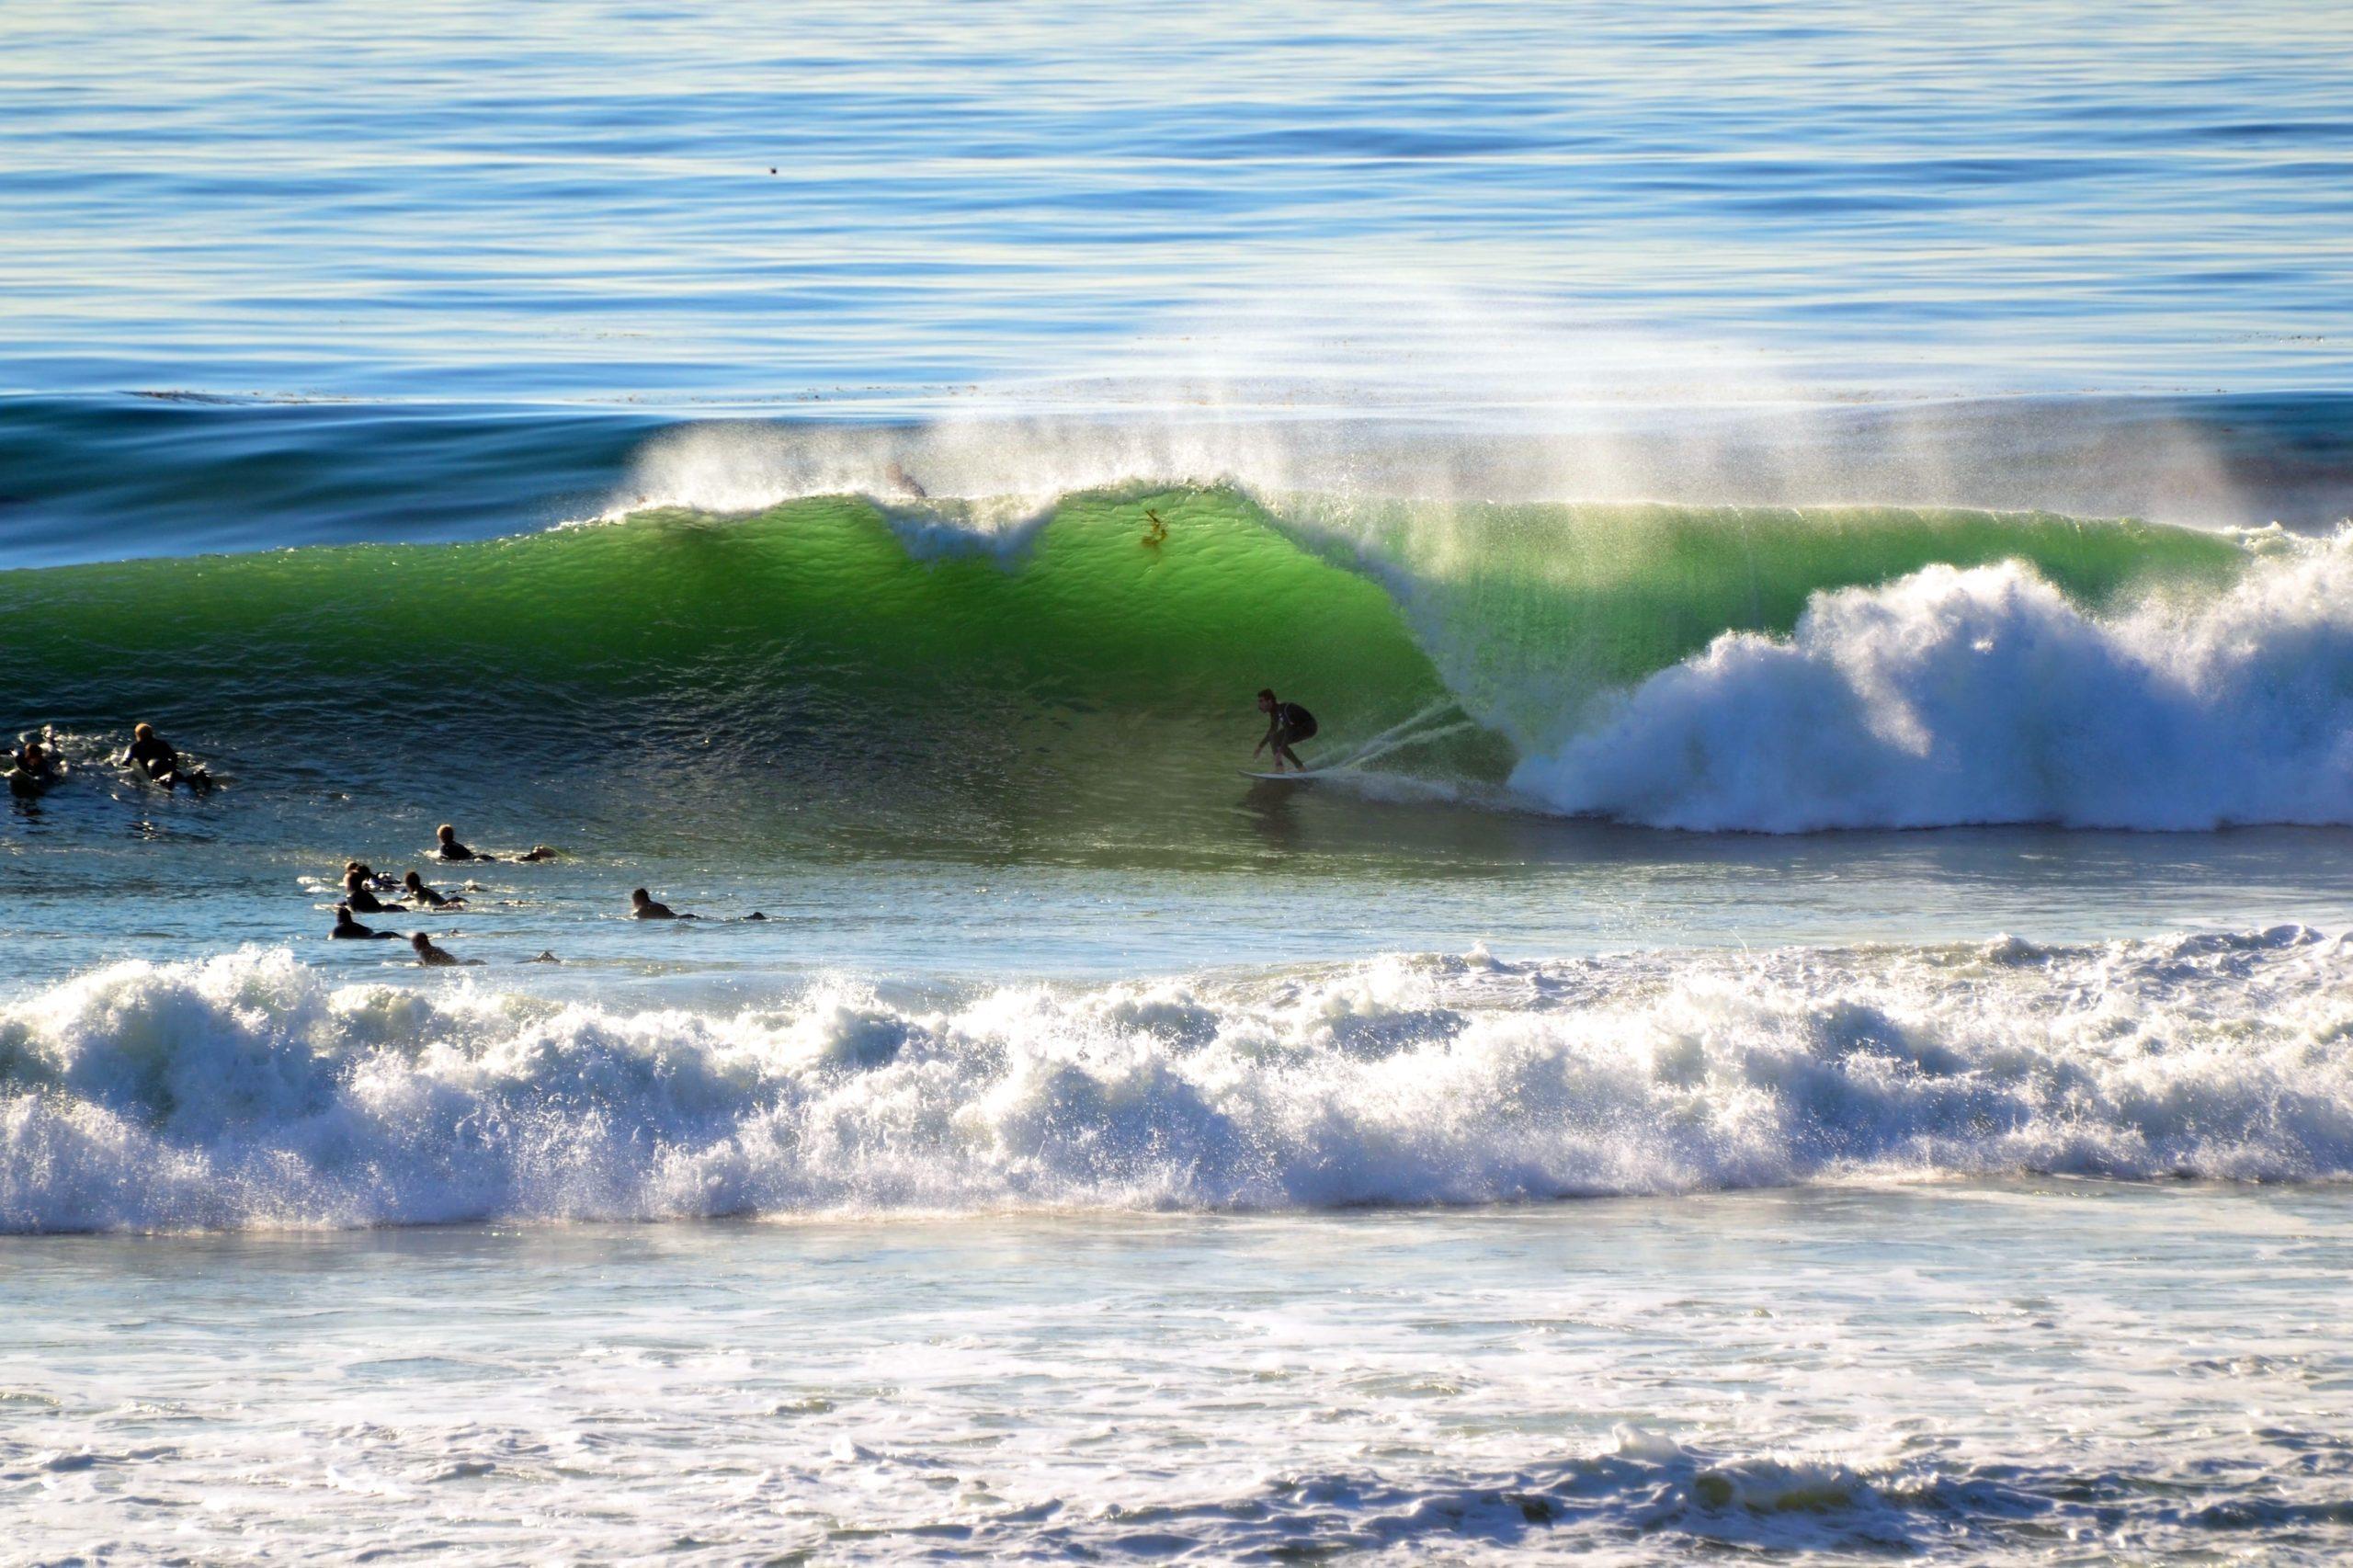 Surfing Encinitas - Swamis